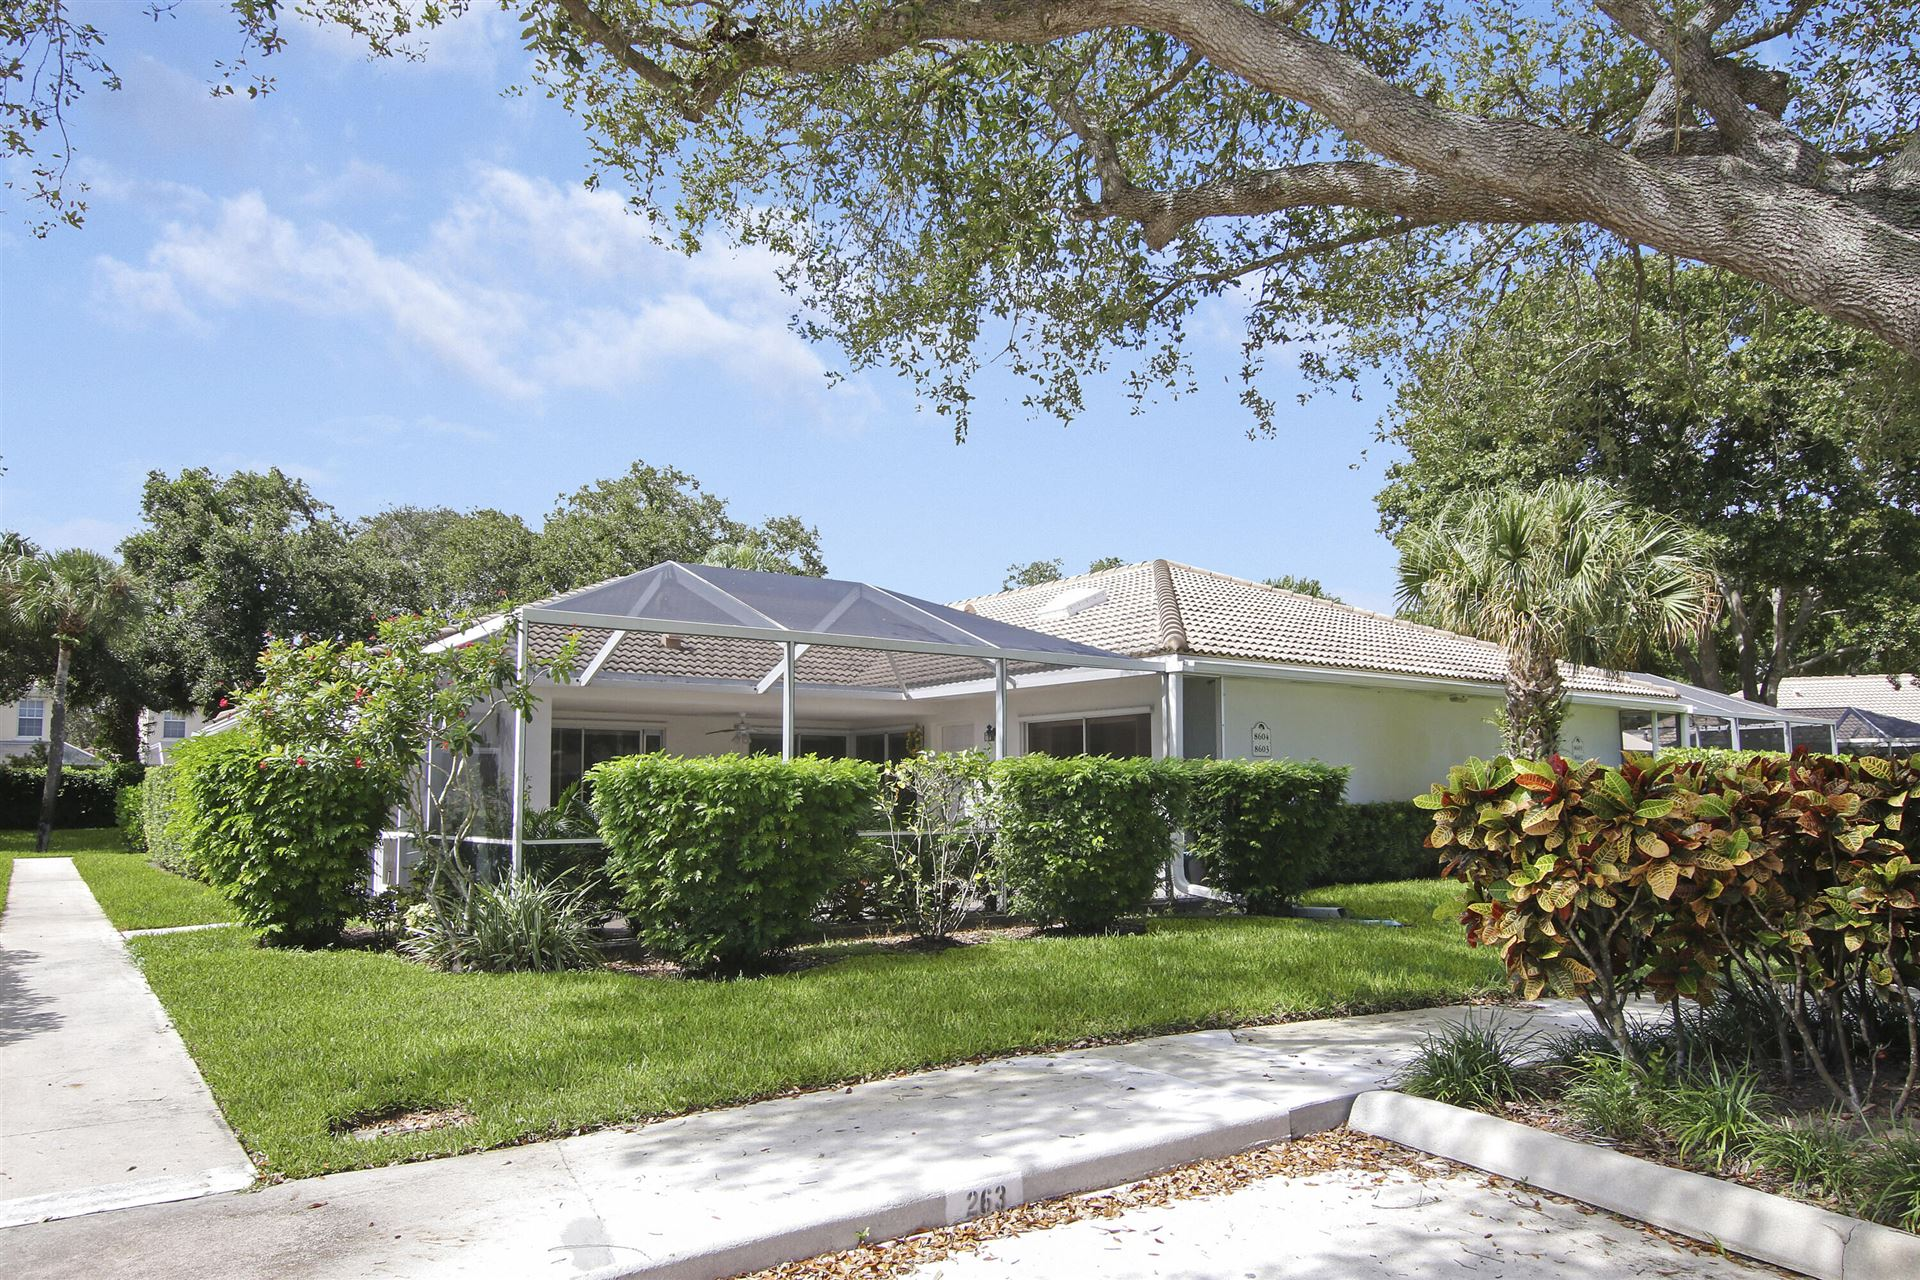 8603 Chapman Oak Court, Palm Beach Gardens, FL 33410 - MLS#: RX-10751789